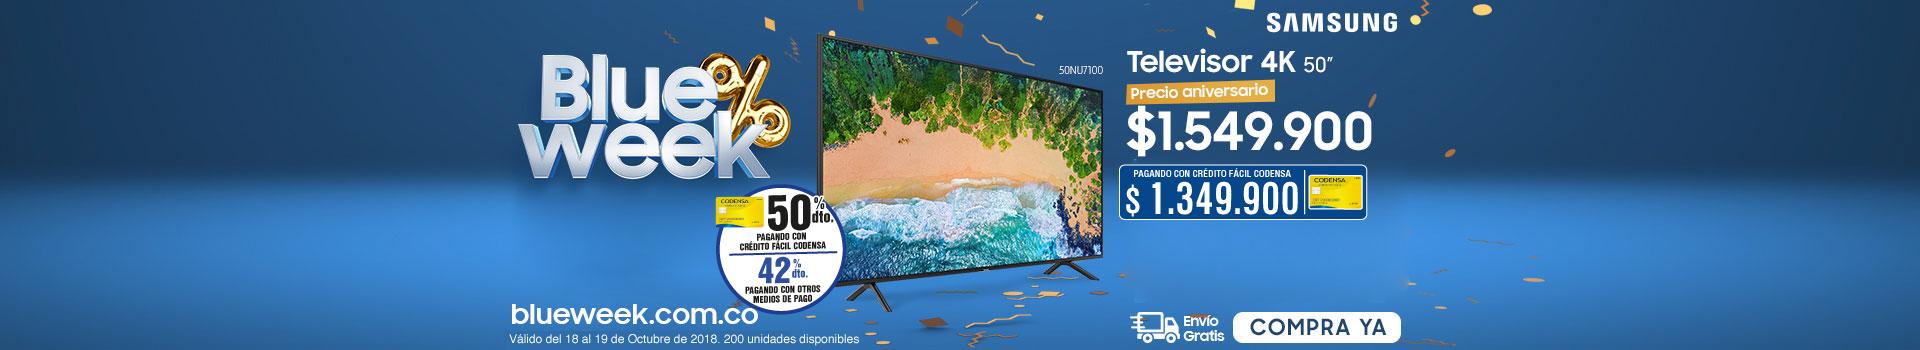 AK-KT-BCAT-5-TV-PP---Samsung-50NU7100-Oct19